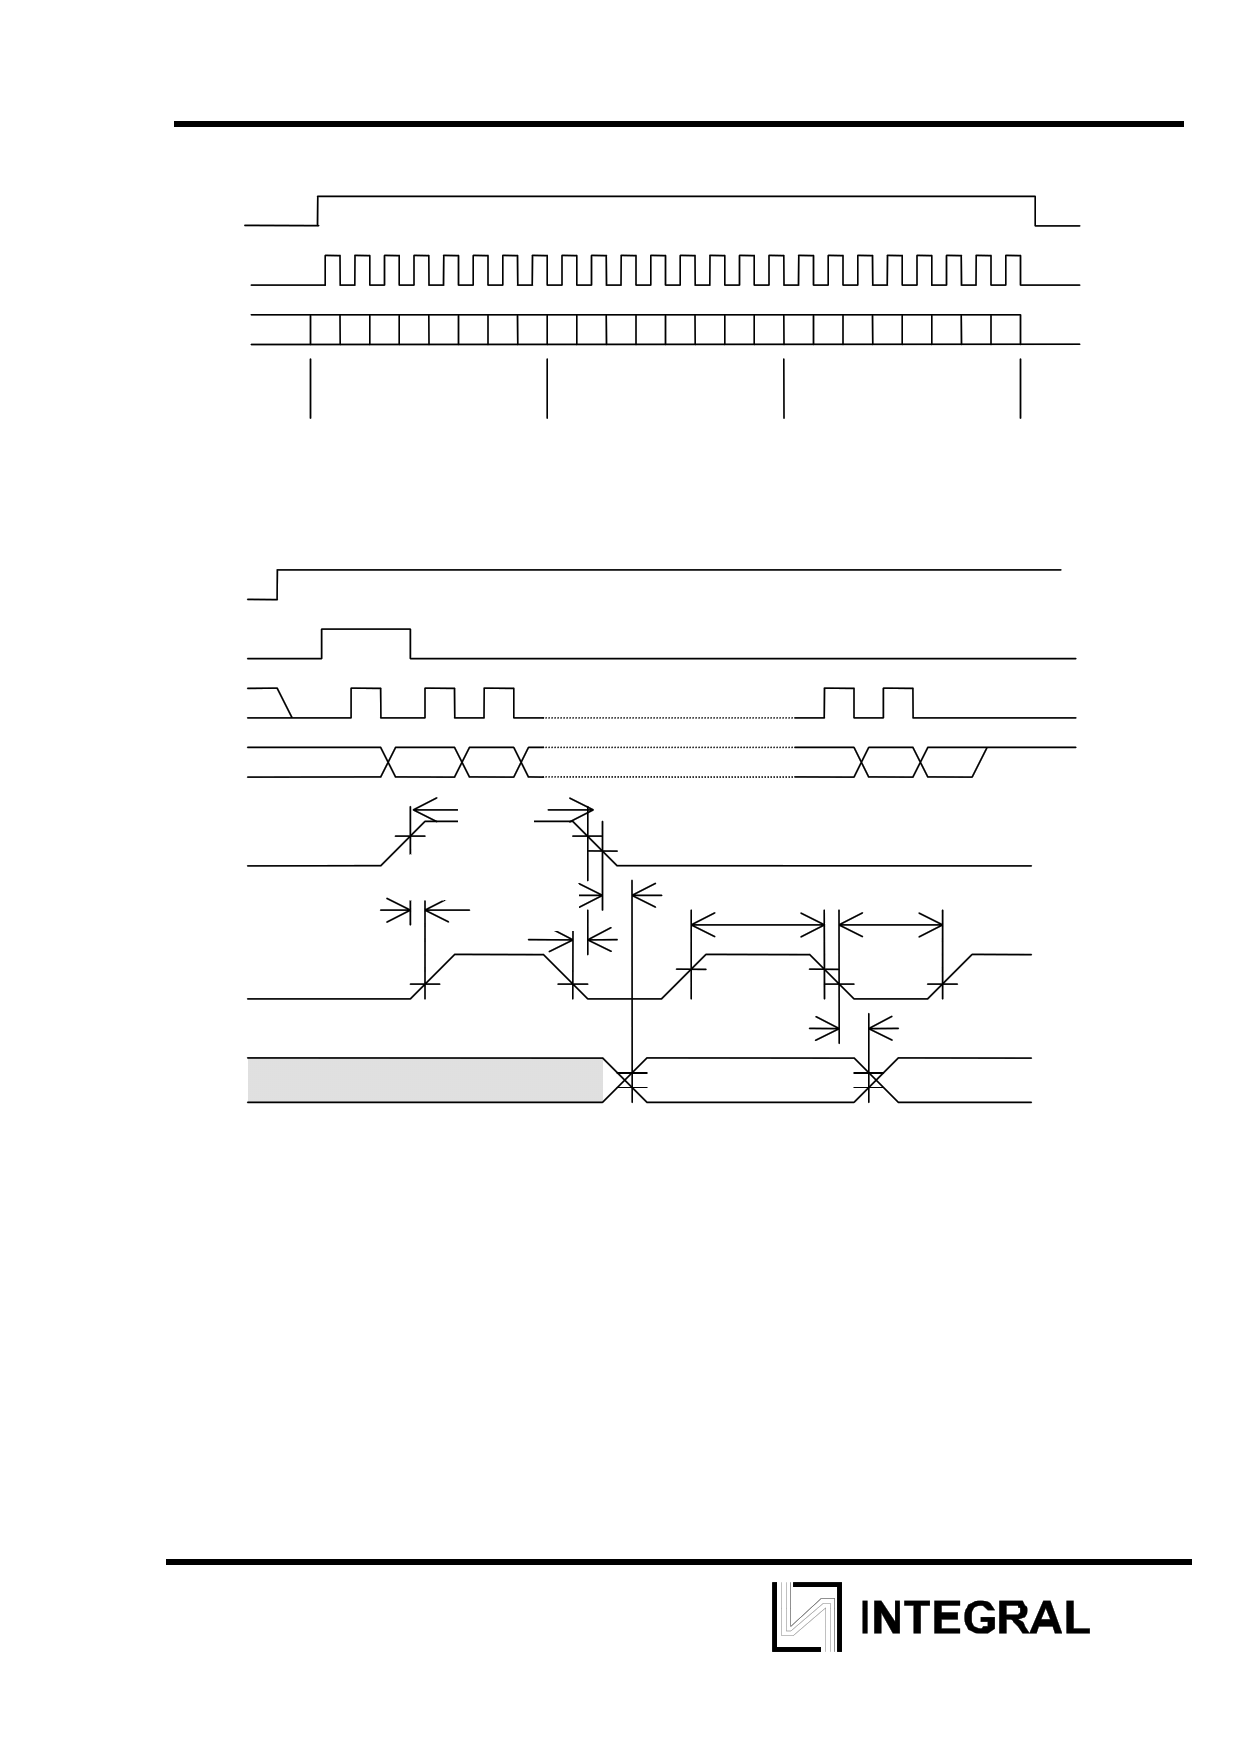 IZE4428 電子部品, 半導体